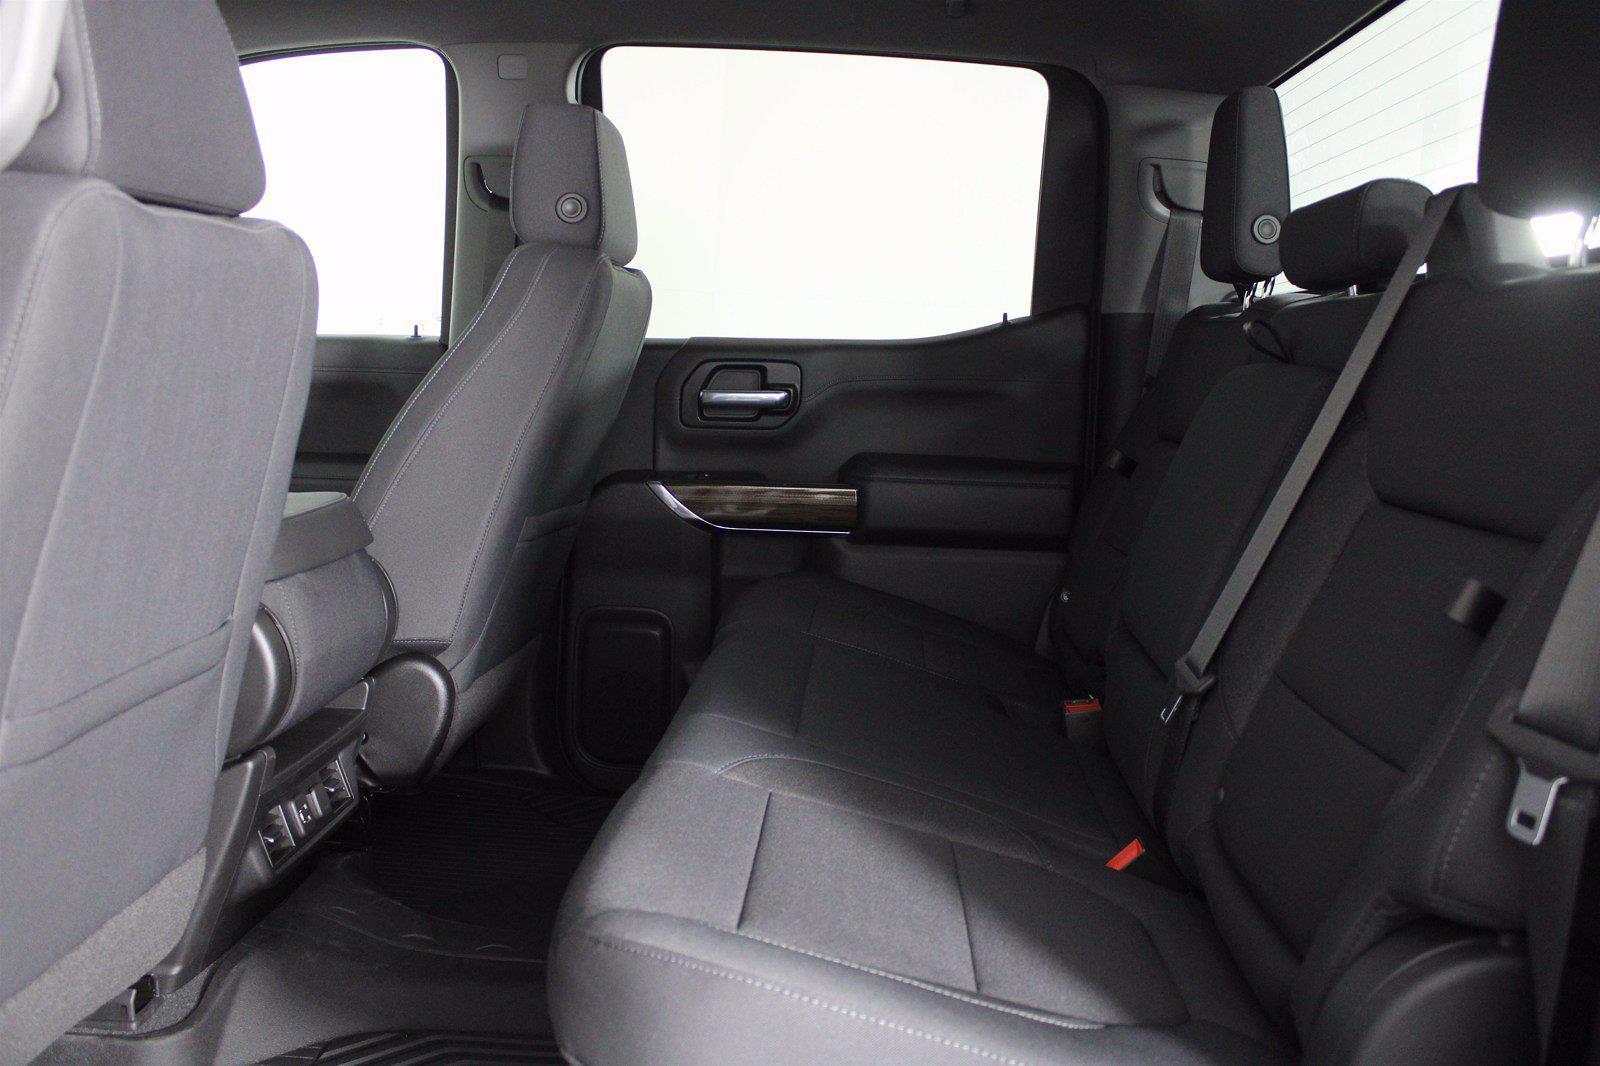 2021 Chevrolet Silverado 1500 Crew Cab 4x4, Pickup #D110898 - photo 15